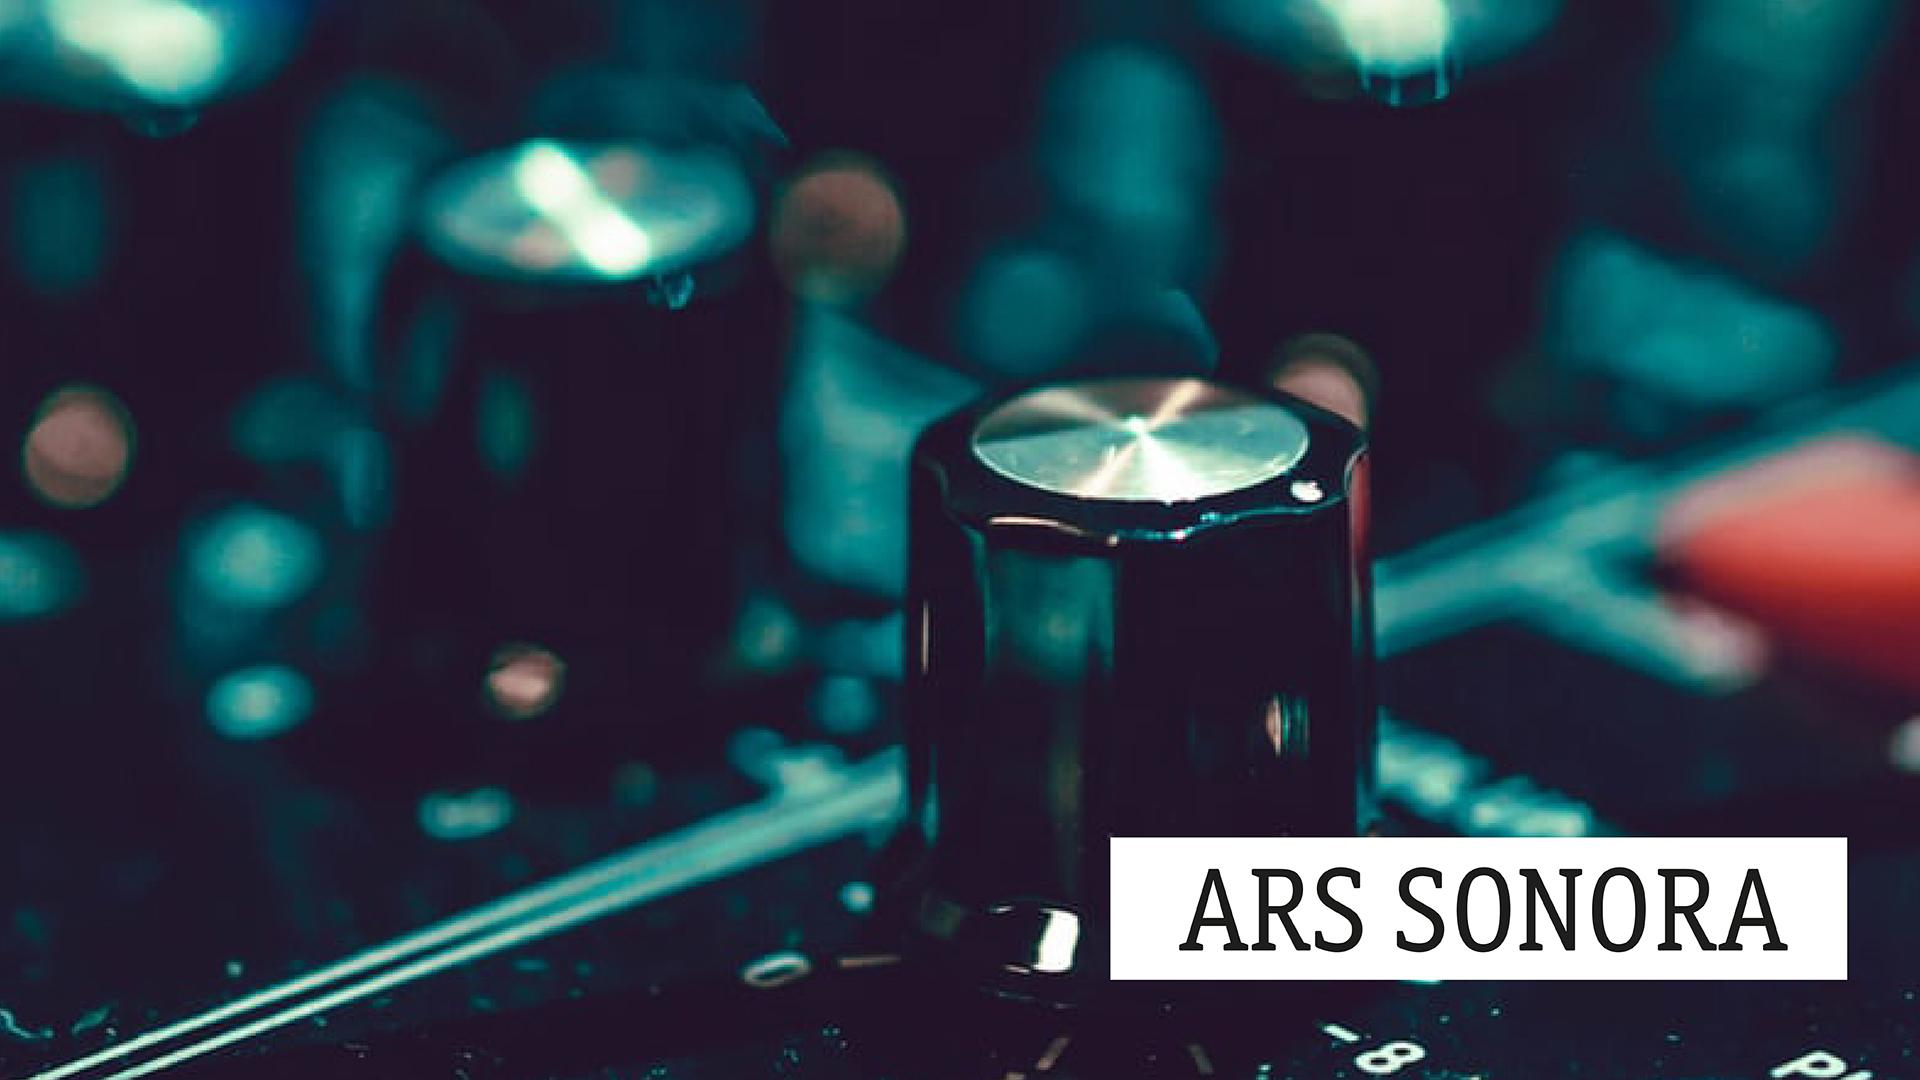 Ars sonora - RTVE.es